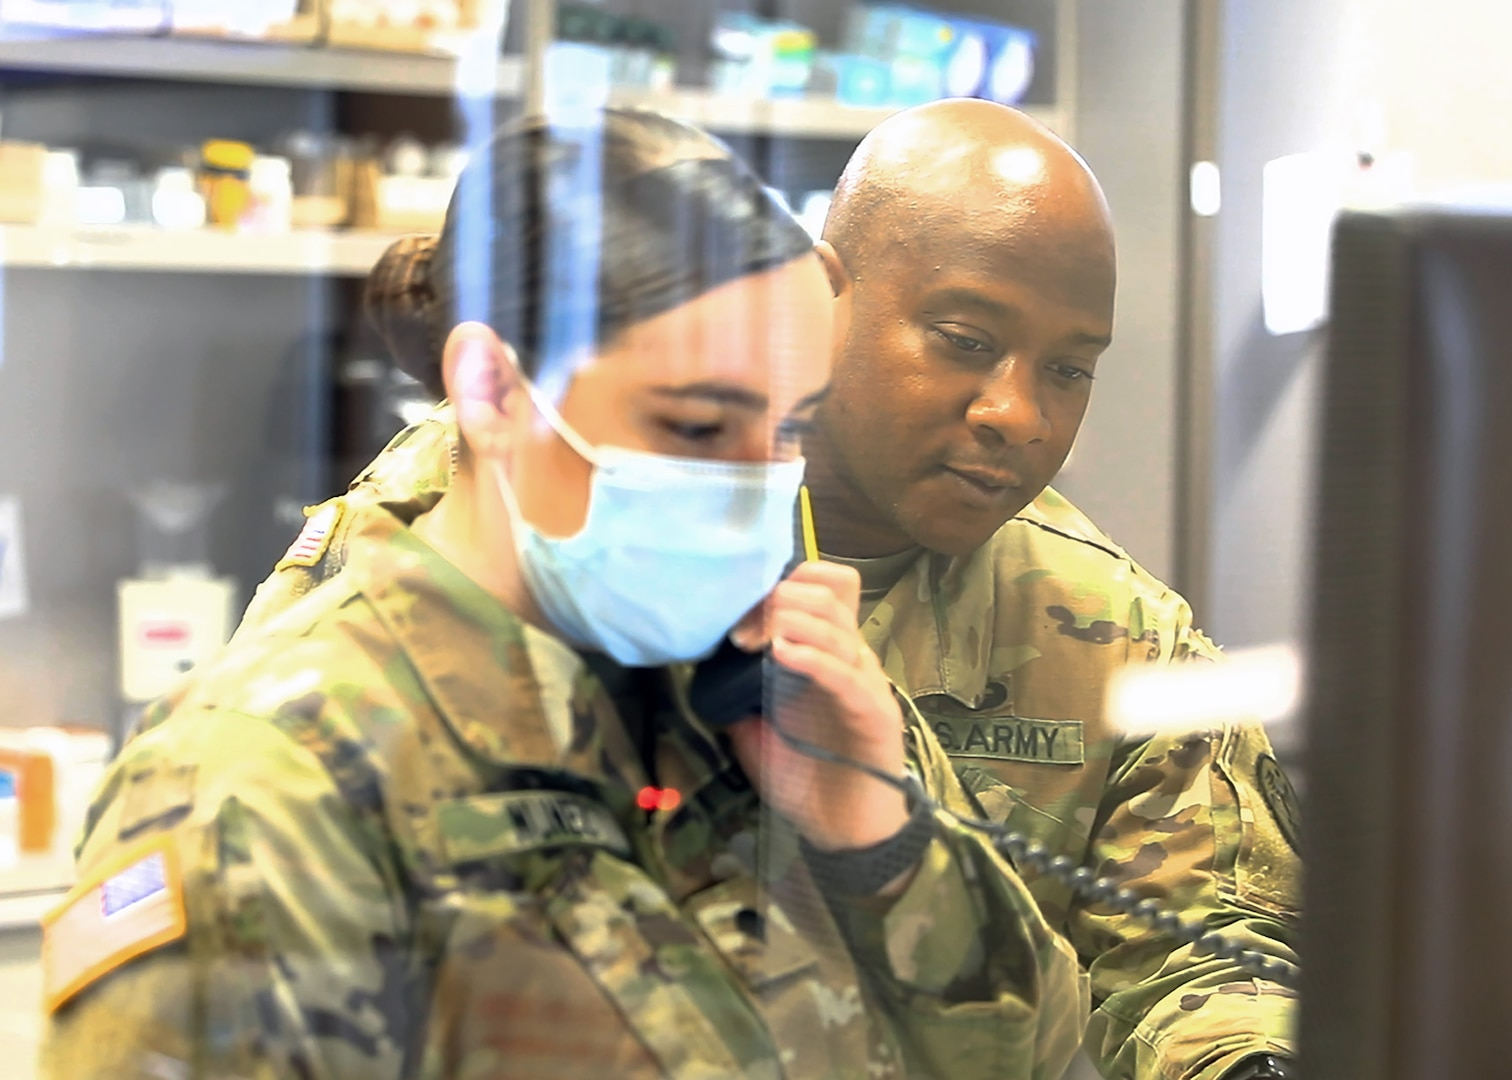 Georgia native, pharmacy tech finds fulfillment serving overseas